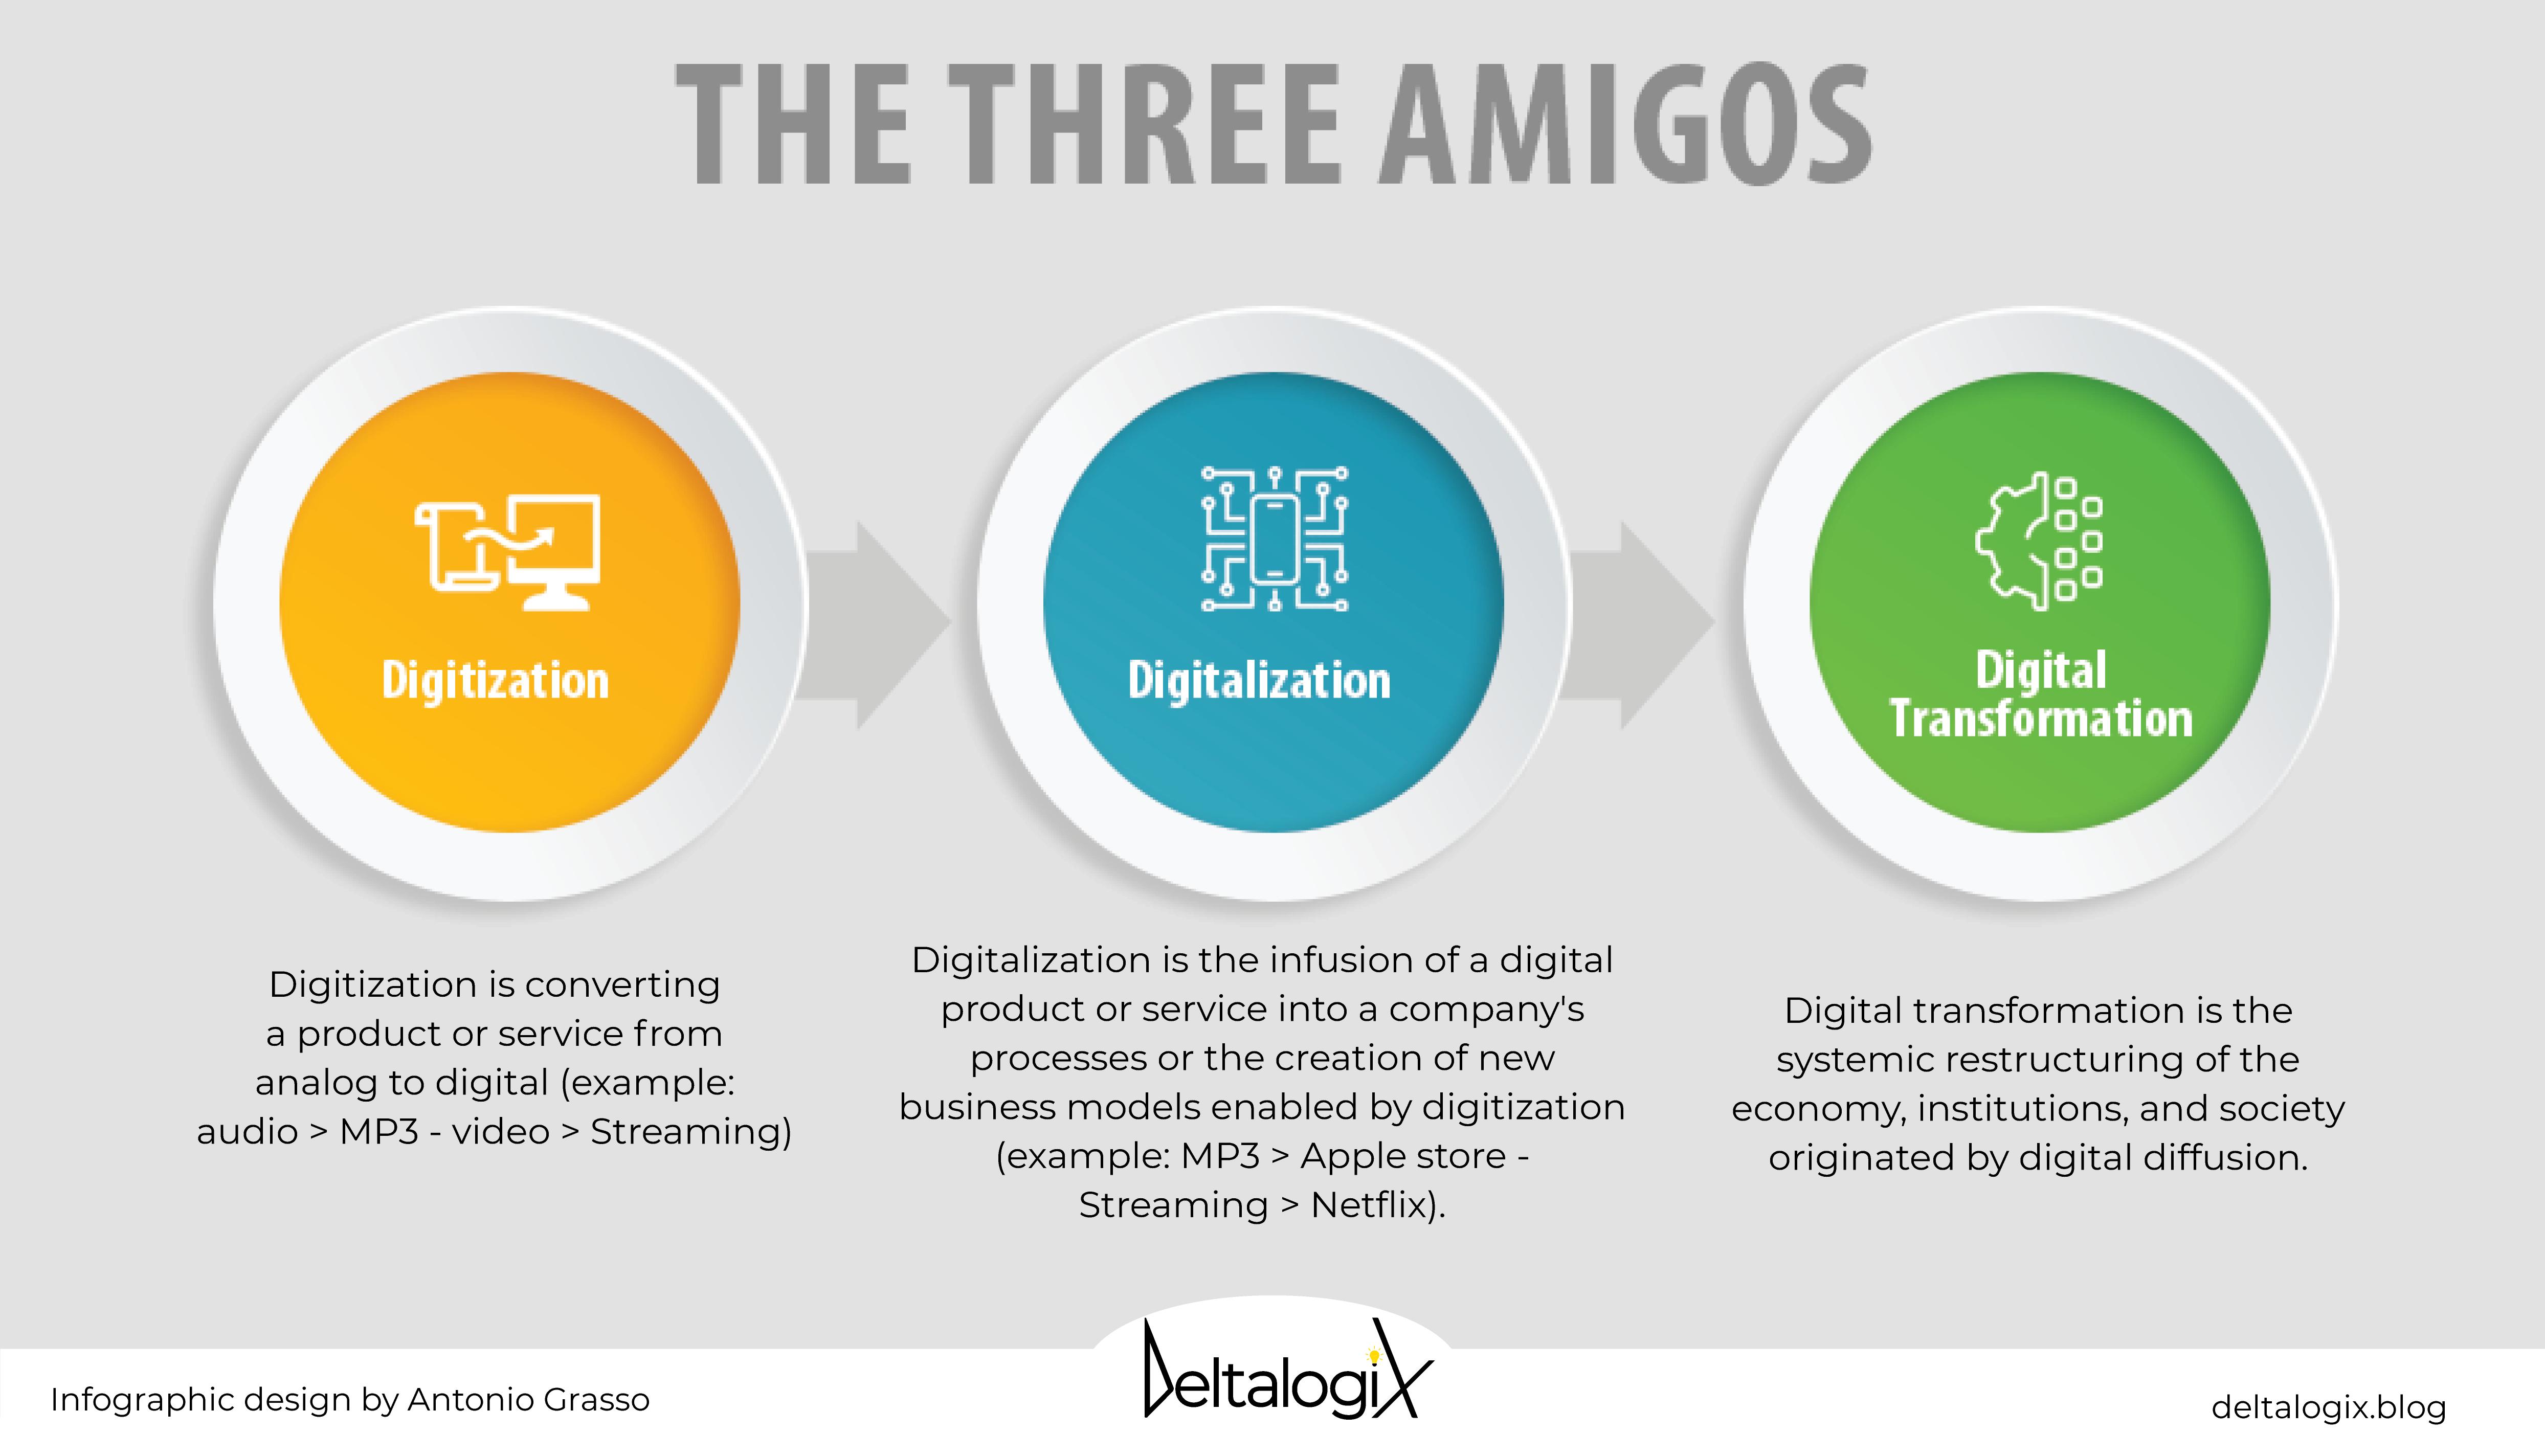 Digitization, digitalization, digital transformation